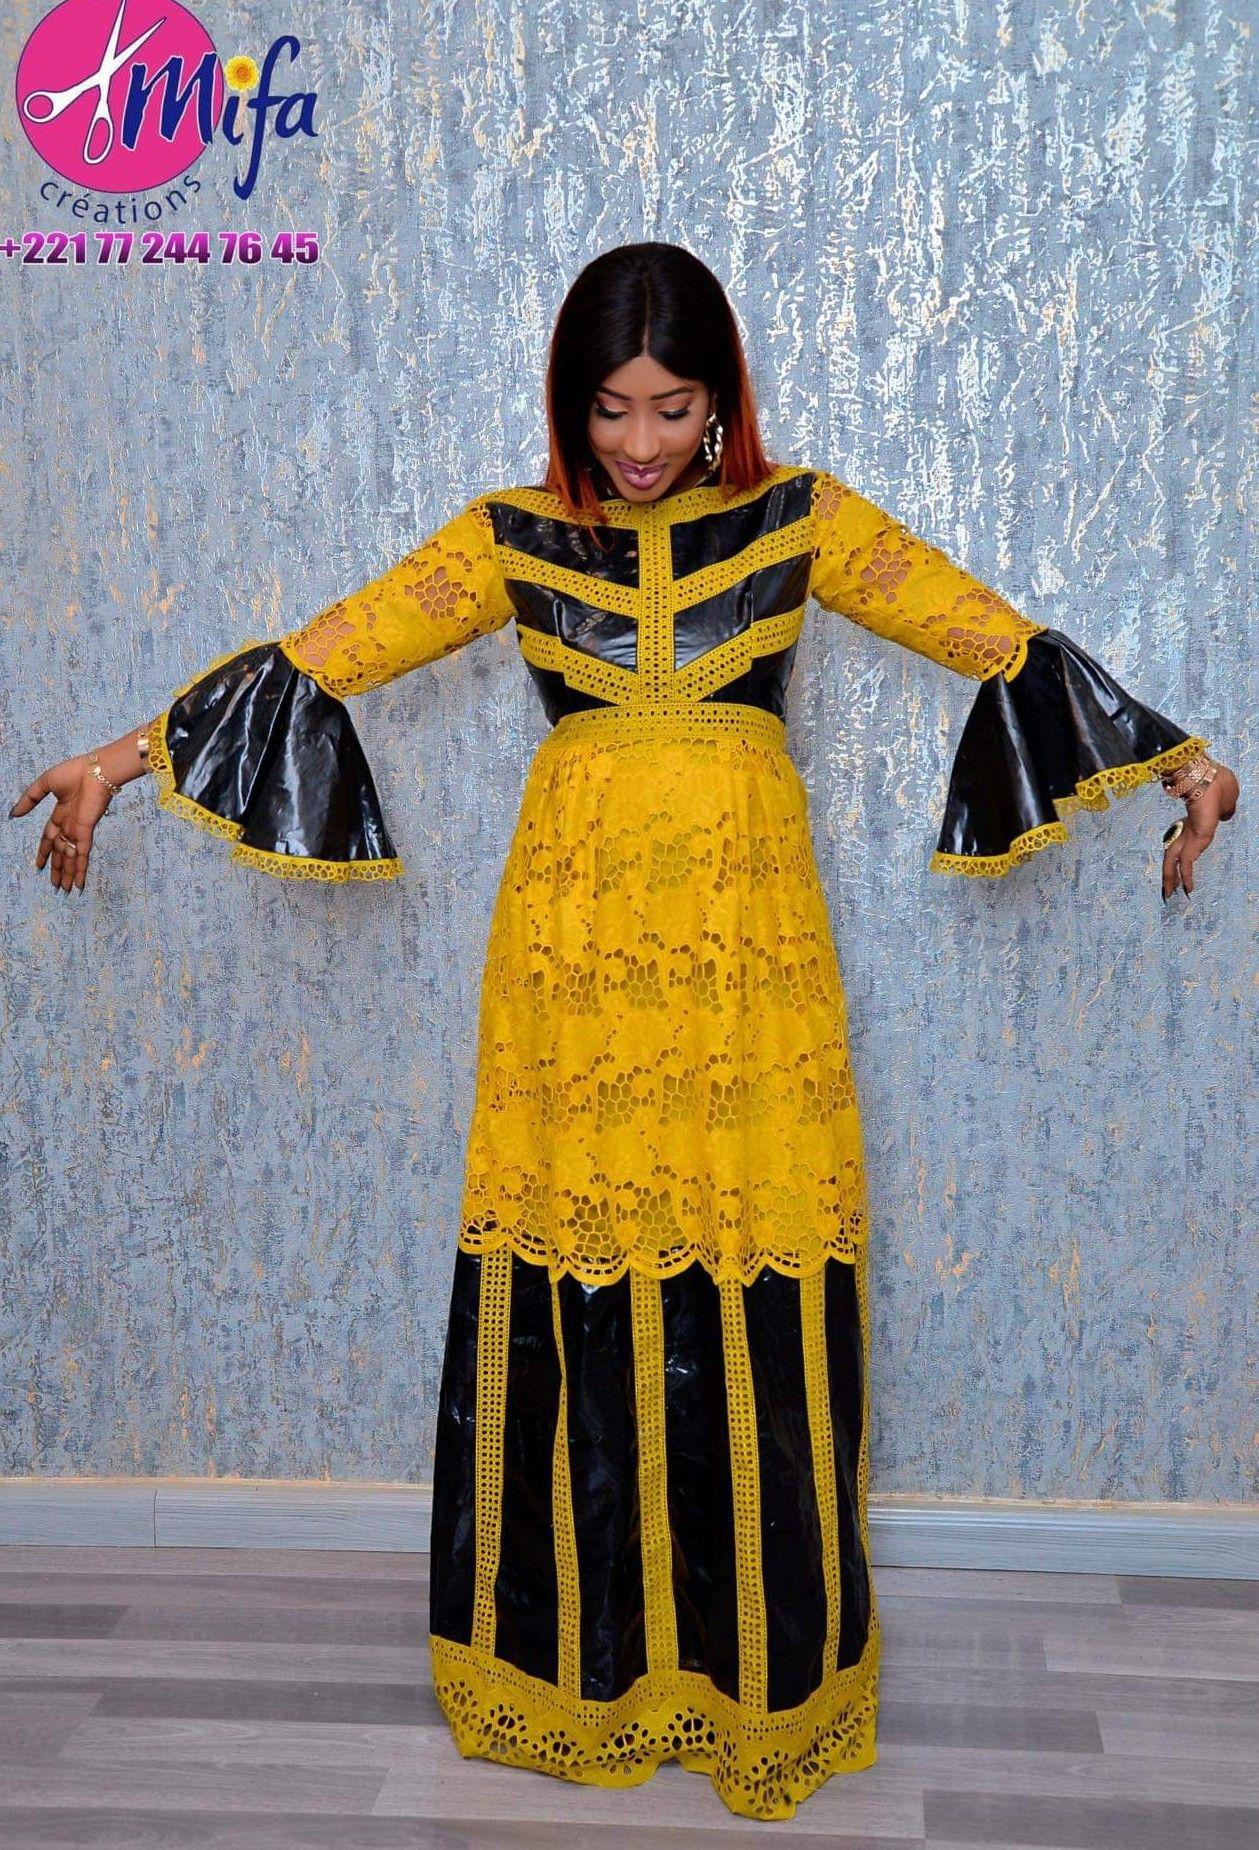 Modele Tenue Africaine, Mode Africaine Robe, Robe En Pagne Africain, Mode  Korité,. Visiter. avril 2019